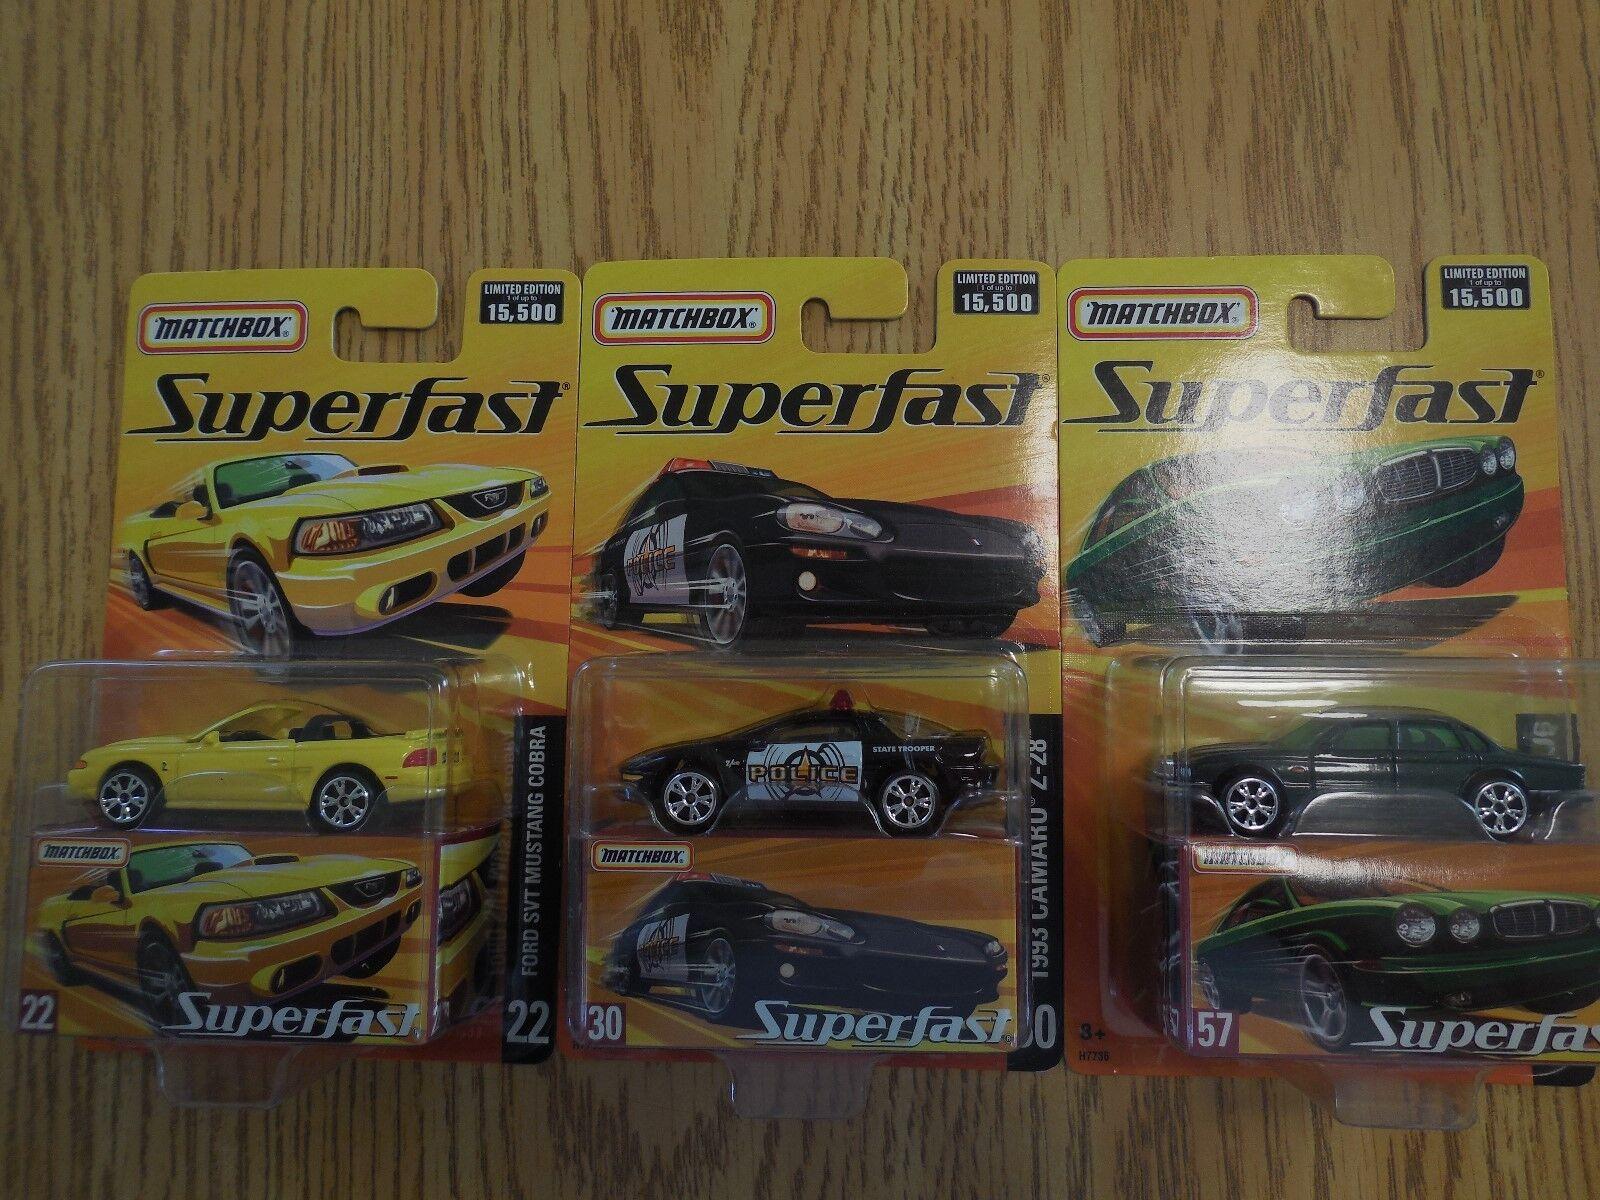 2004 matchbox superfast autos 3 1 mustang corra camaro z-28 - jaguar xj6